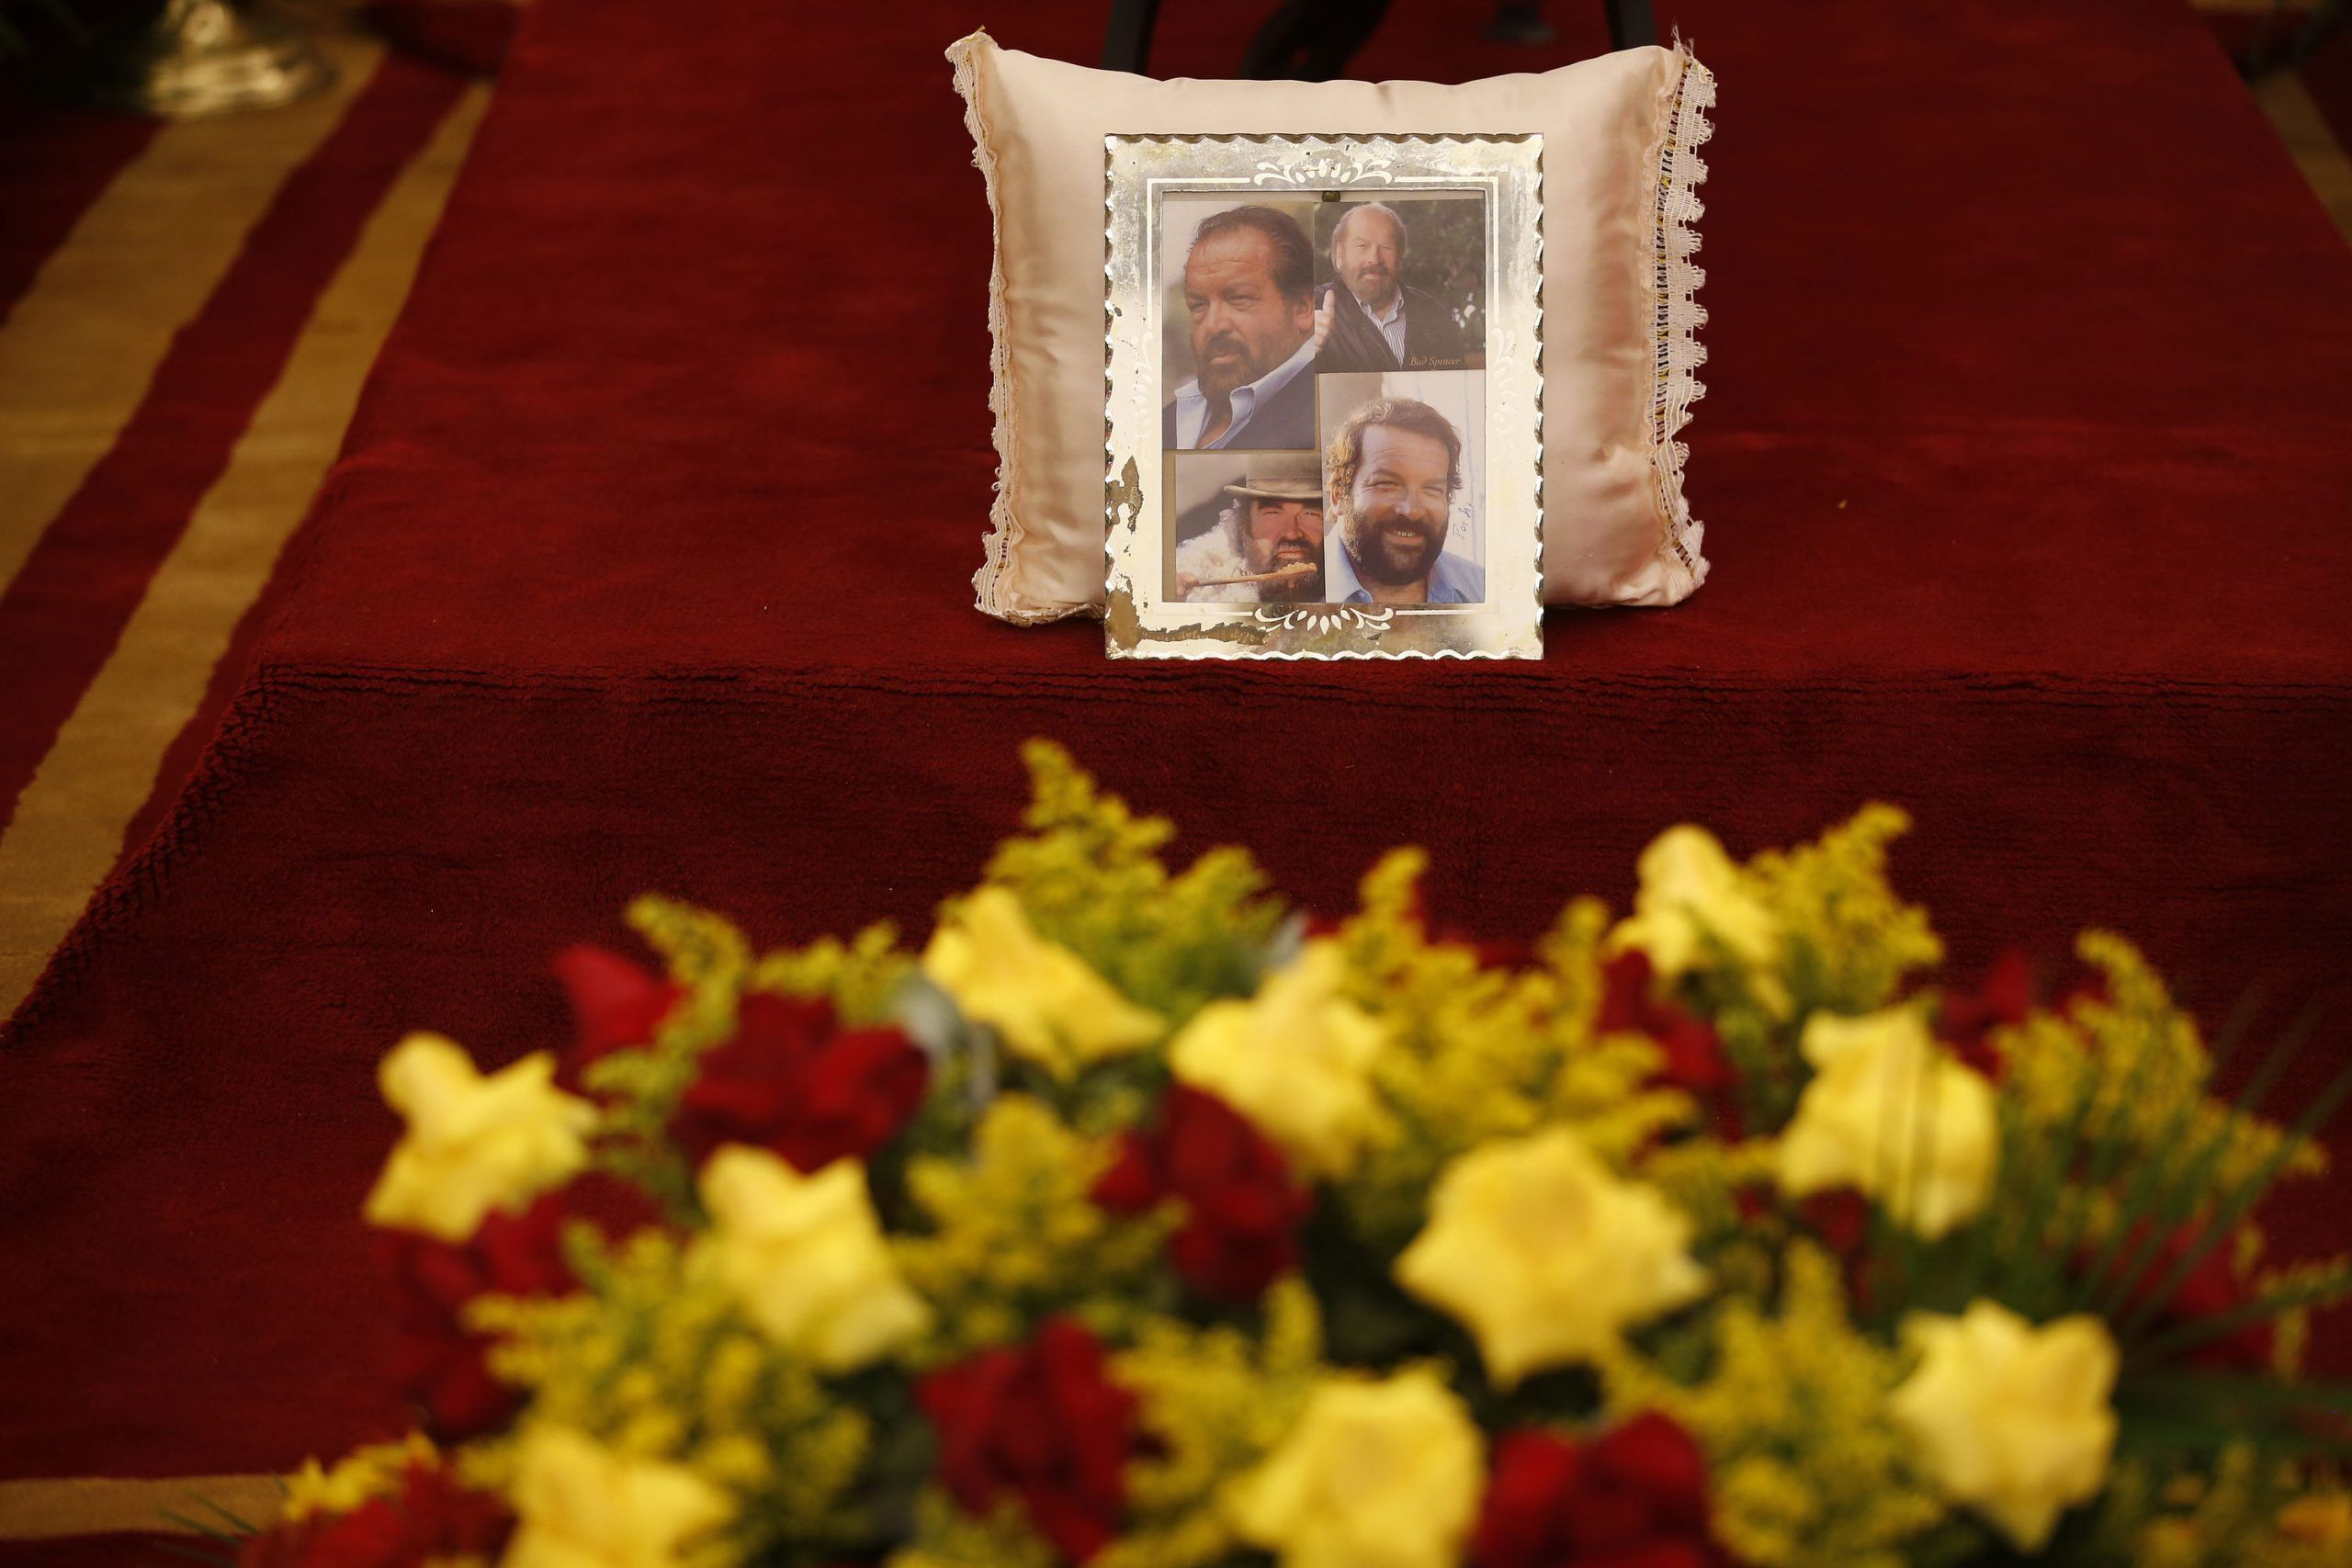 Morte Bud Spencer, i funerali dell'attore a Roma: Terence Hill commosso